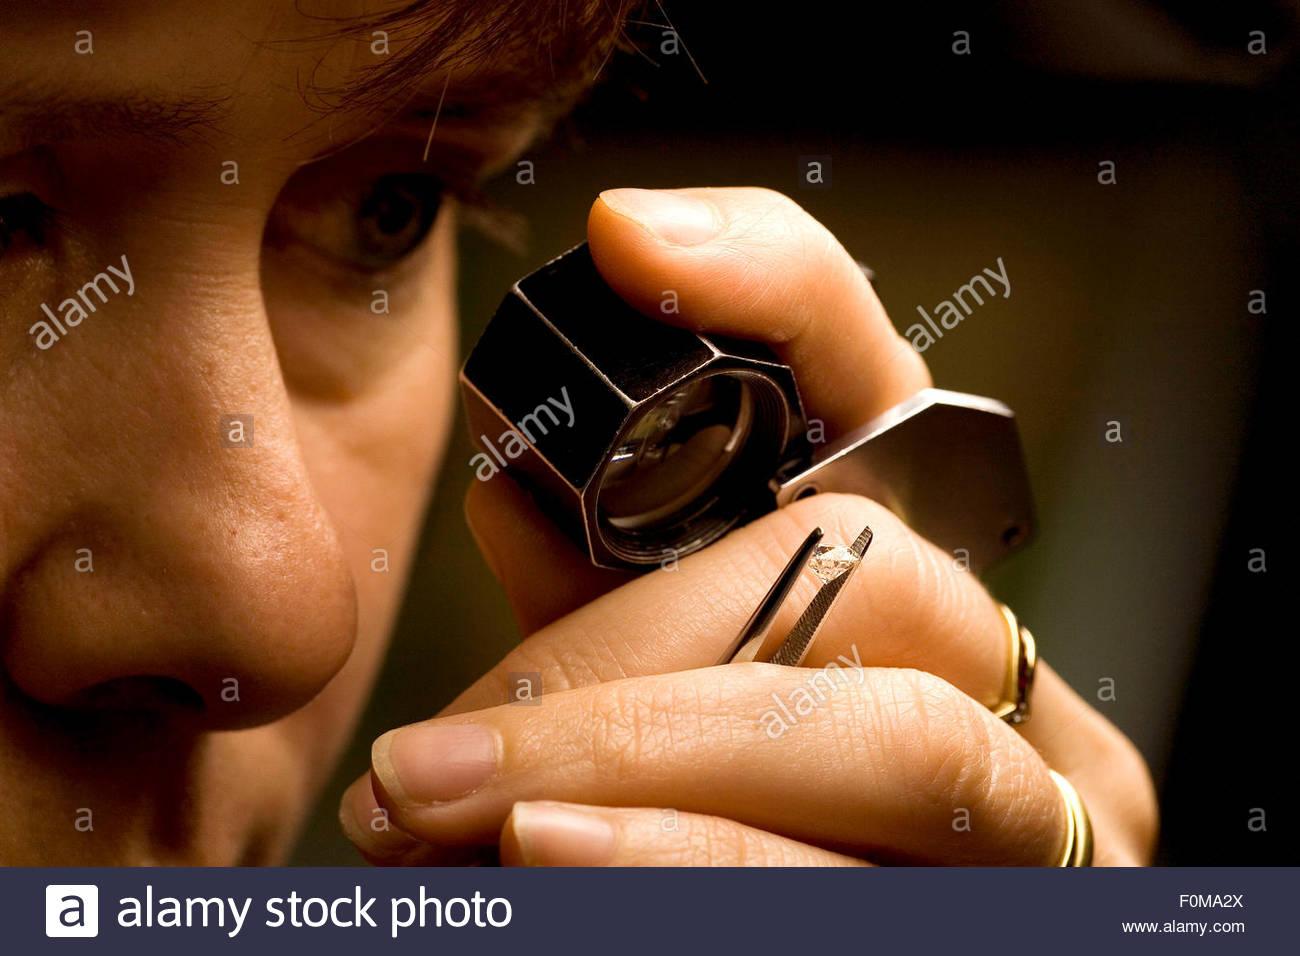 Antwerp, checking the pureness of the diamond, Antwerp Diamond centre, - Stock Image